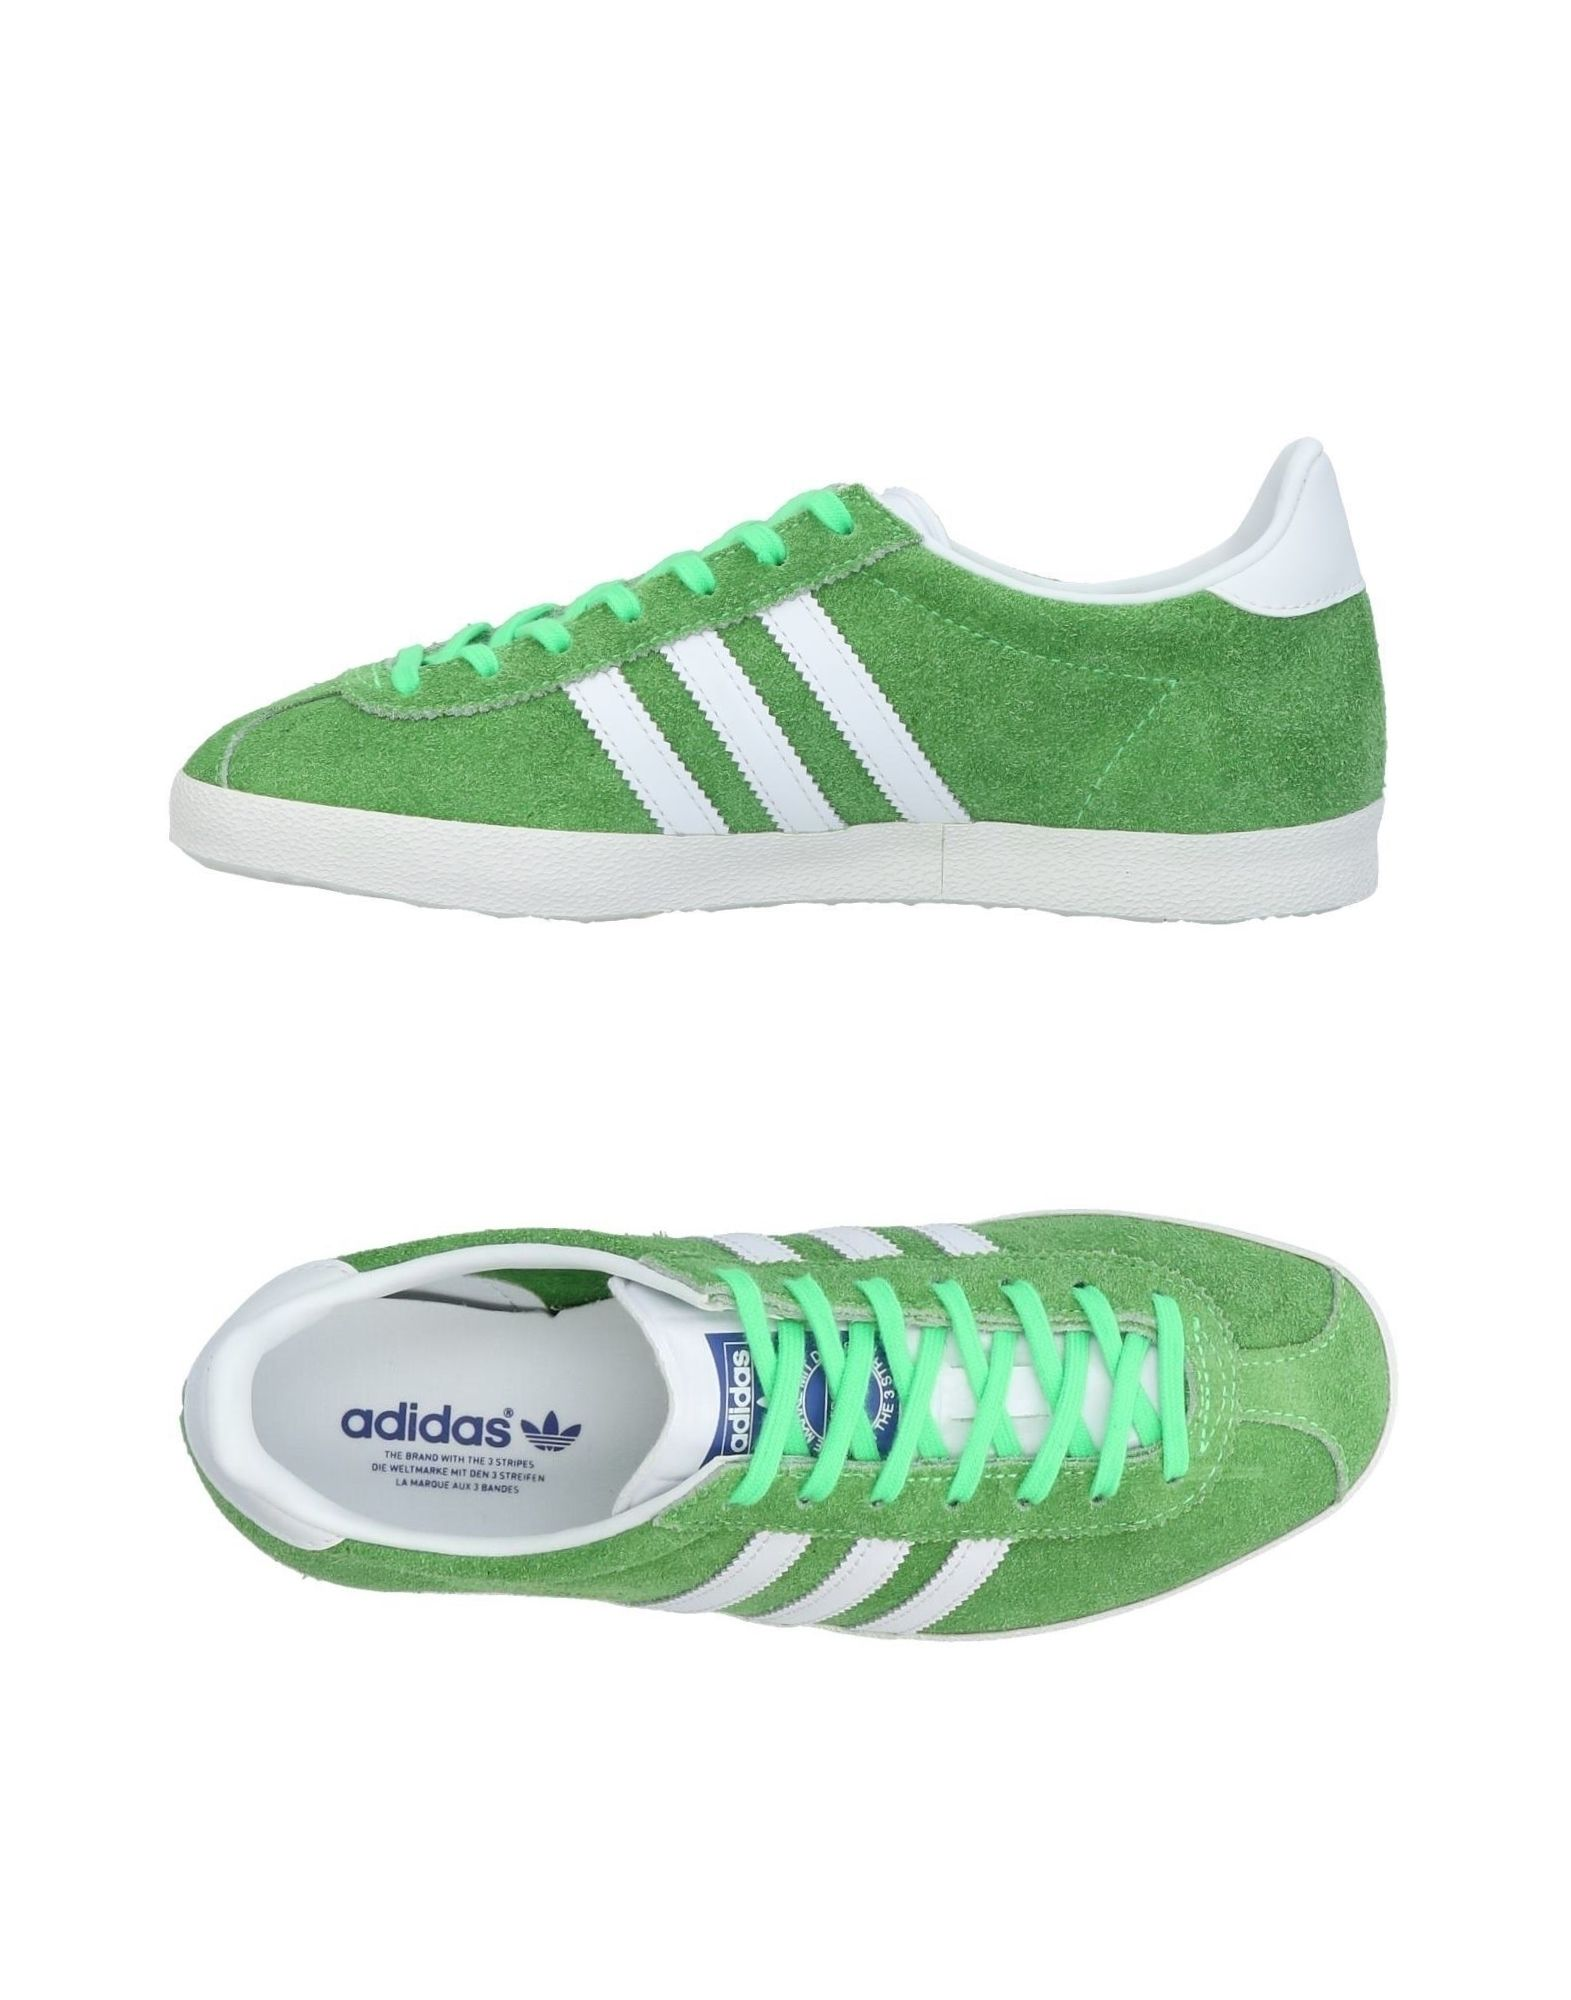 Adidas Originals Sneakers Herren    11448096UL Neue Schuhe ddf7a9